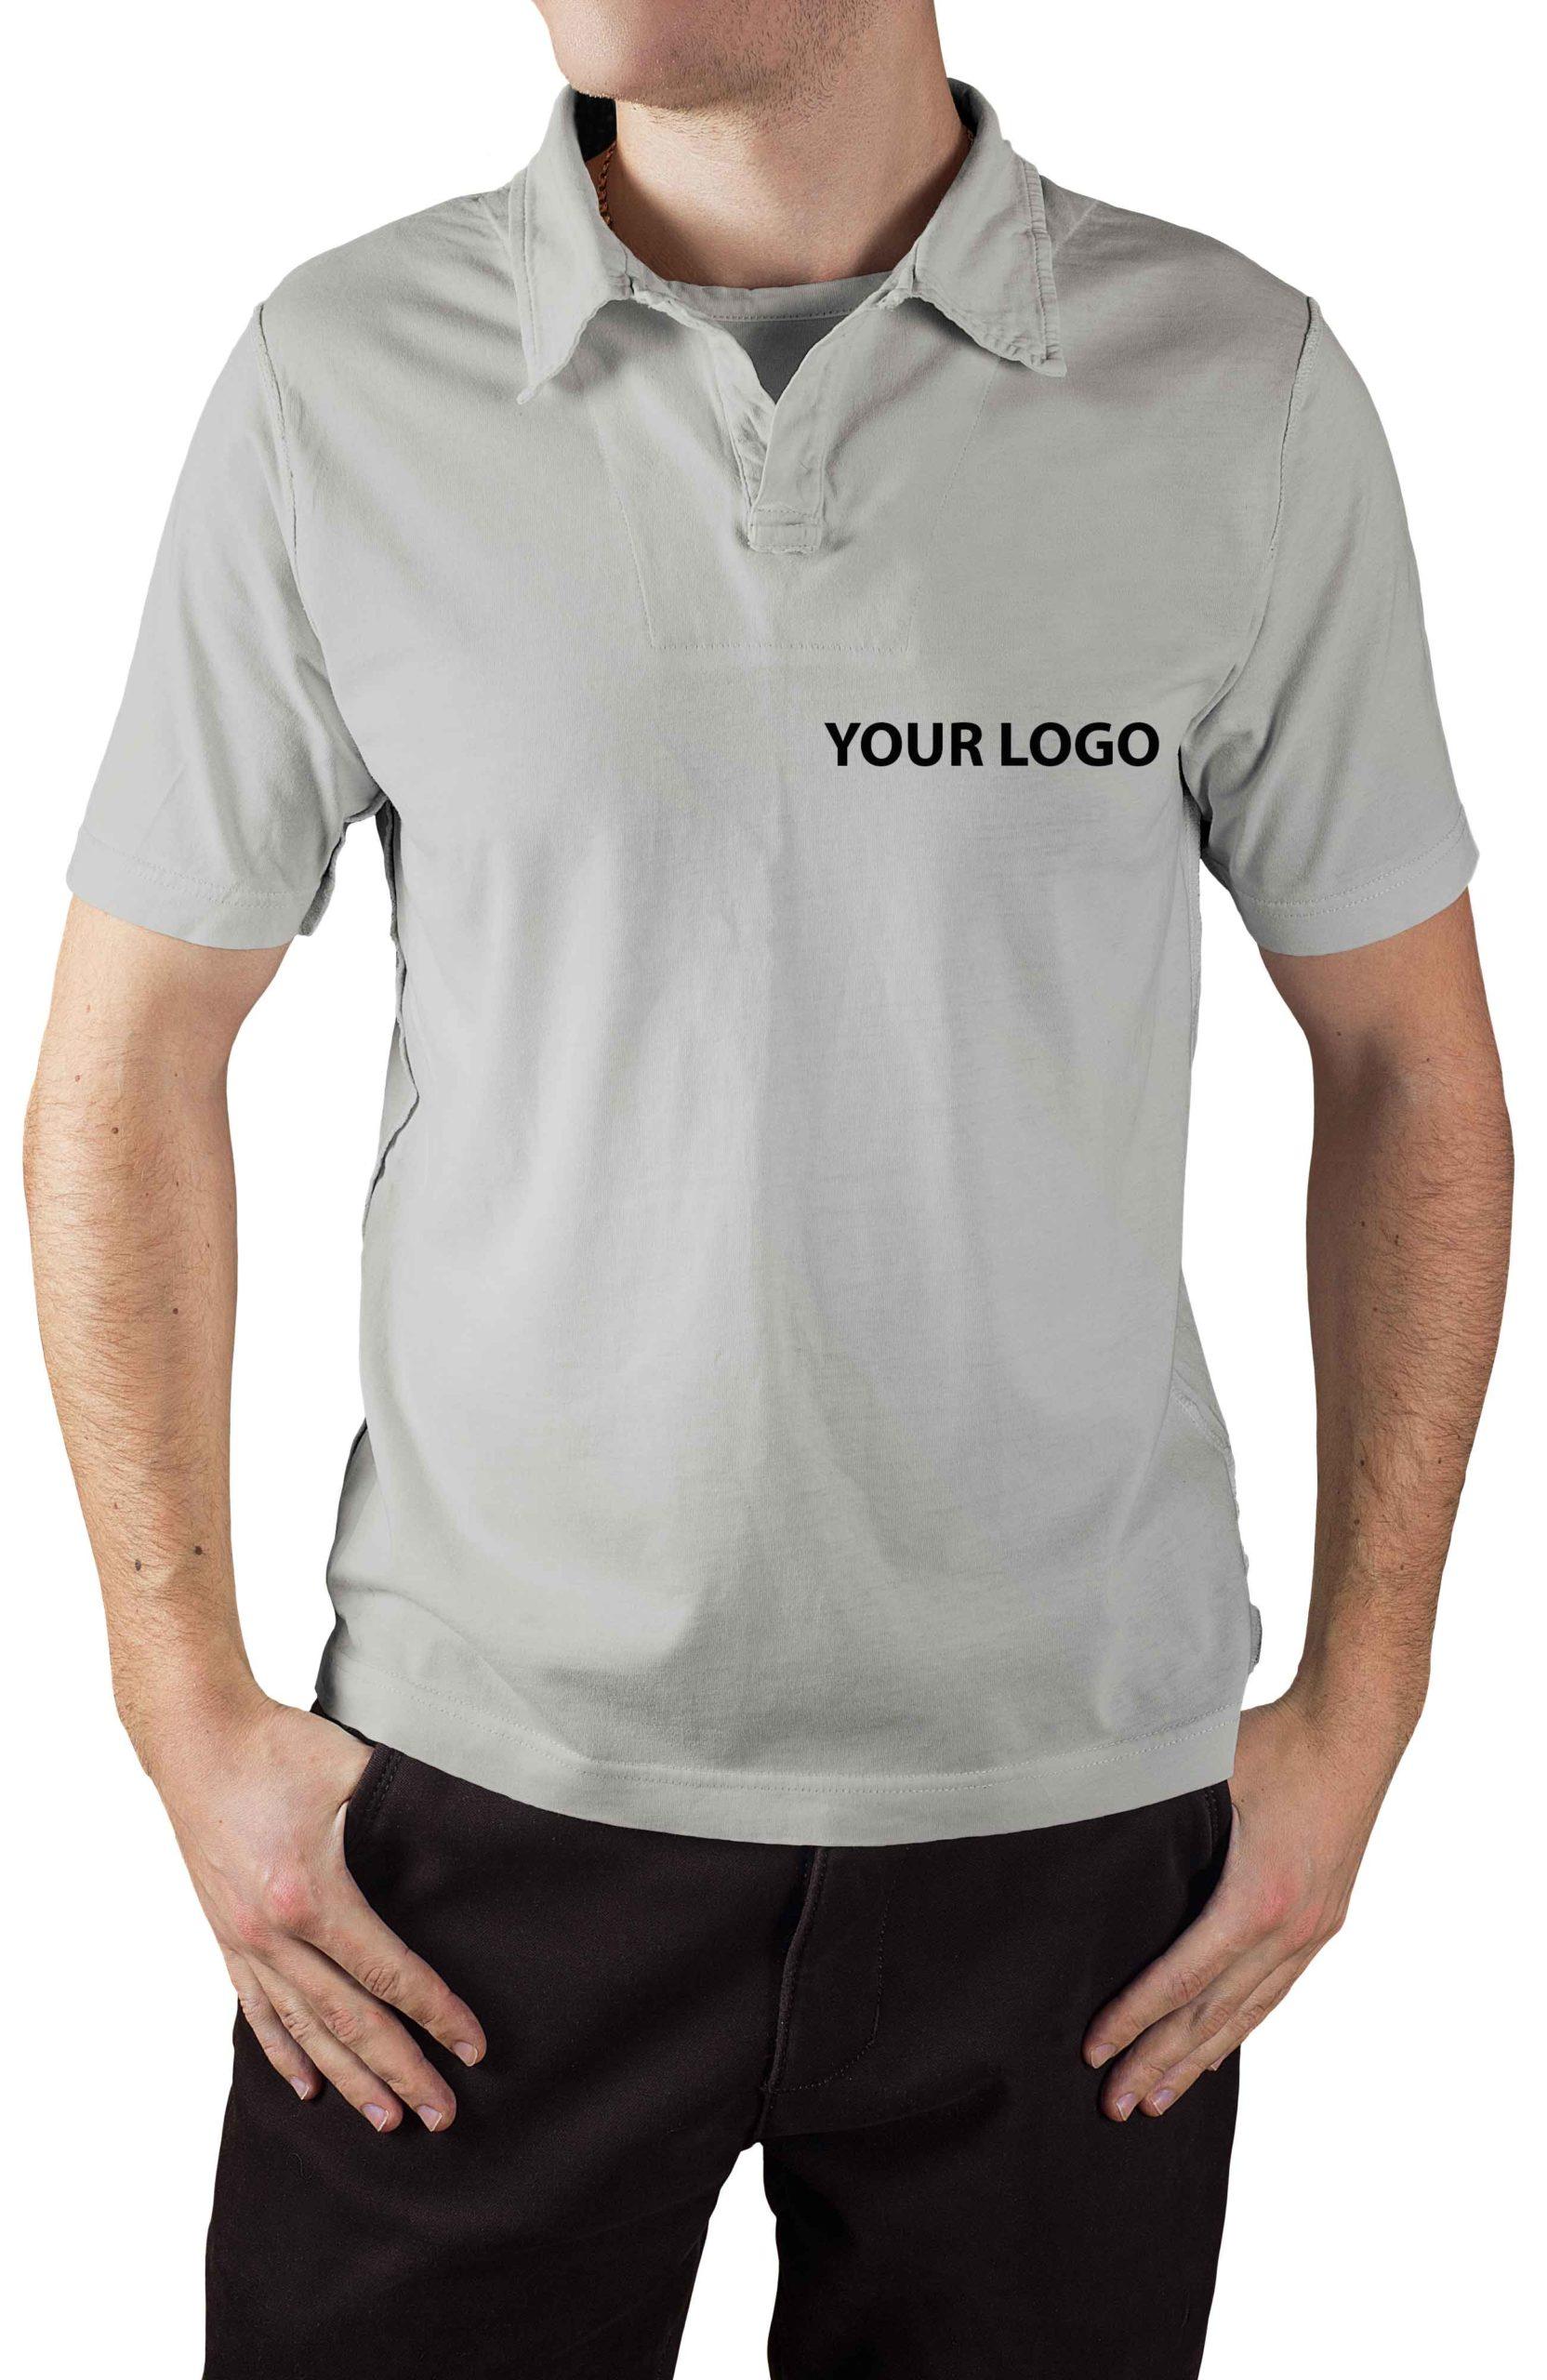 corporate-uniform-t-shirt